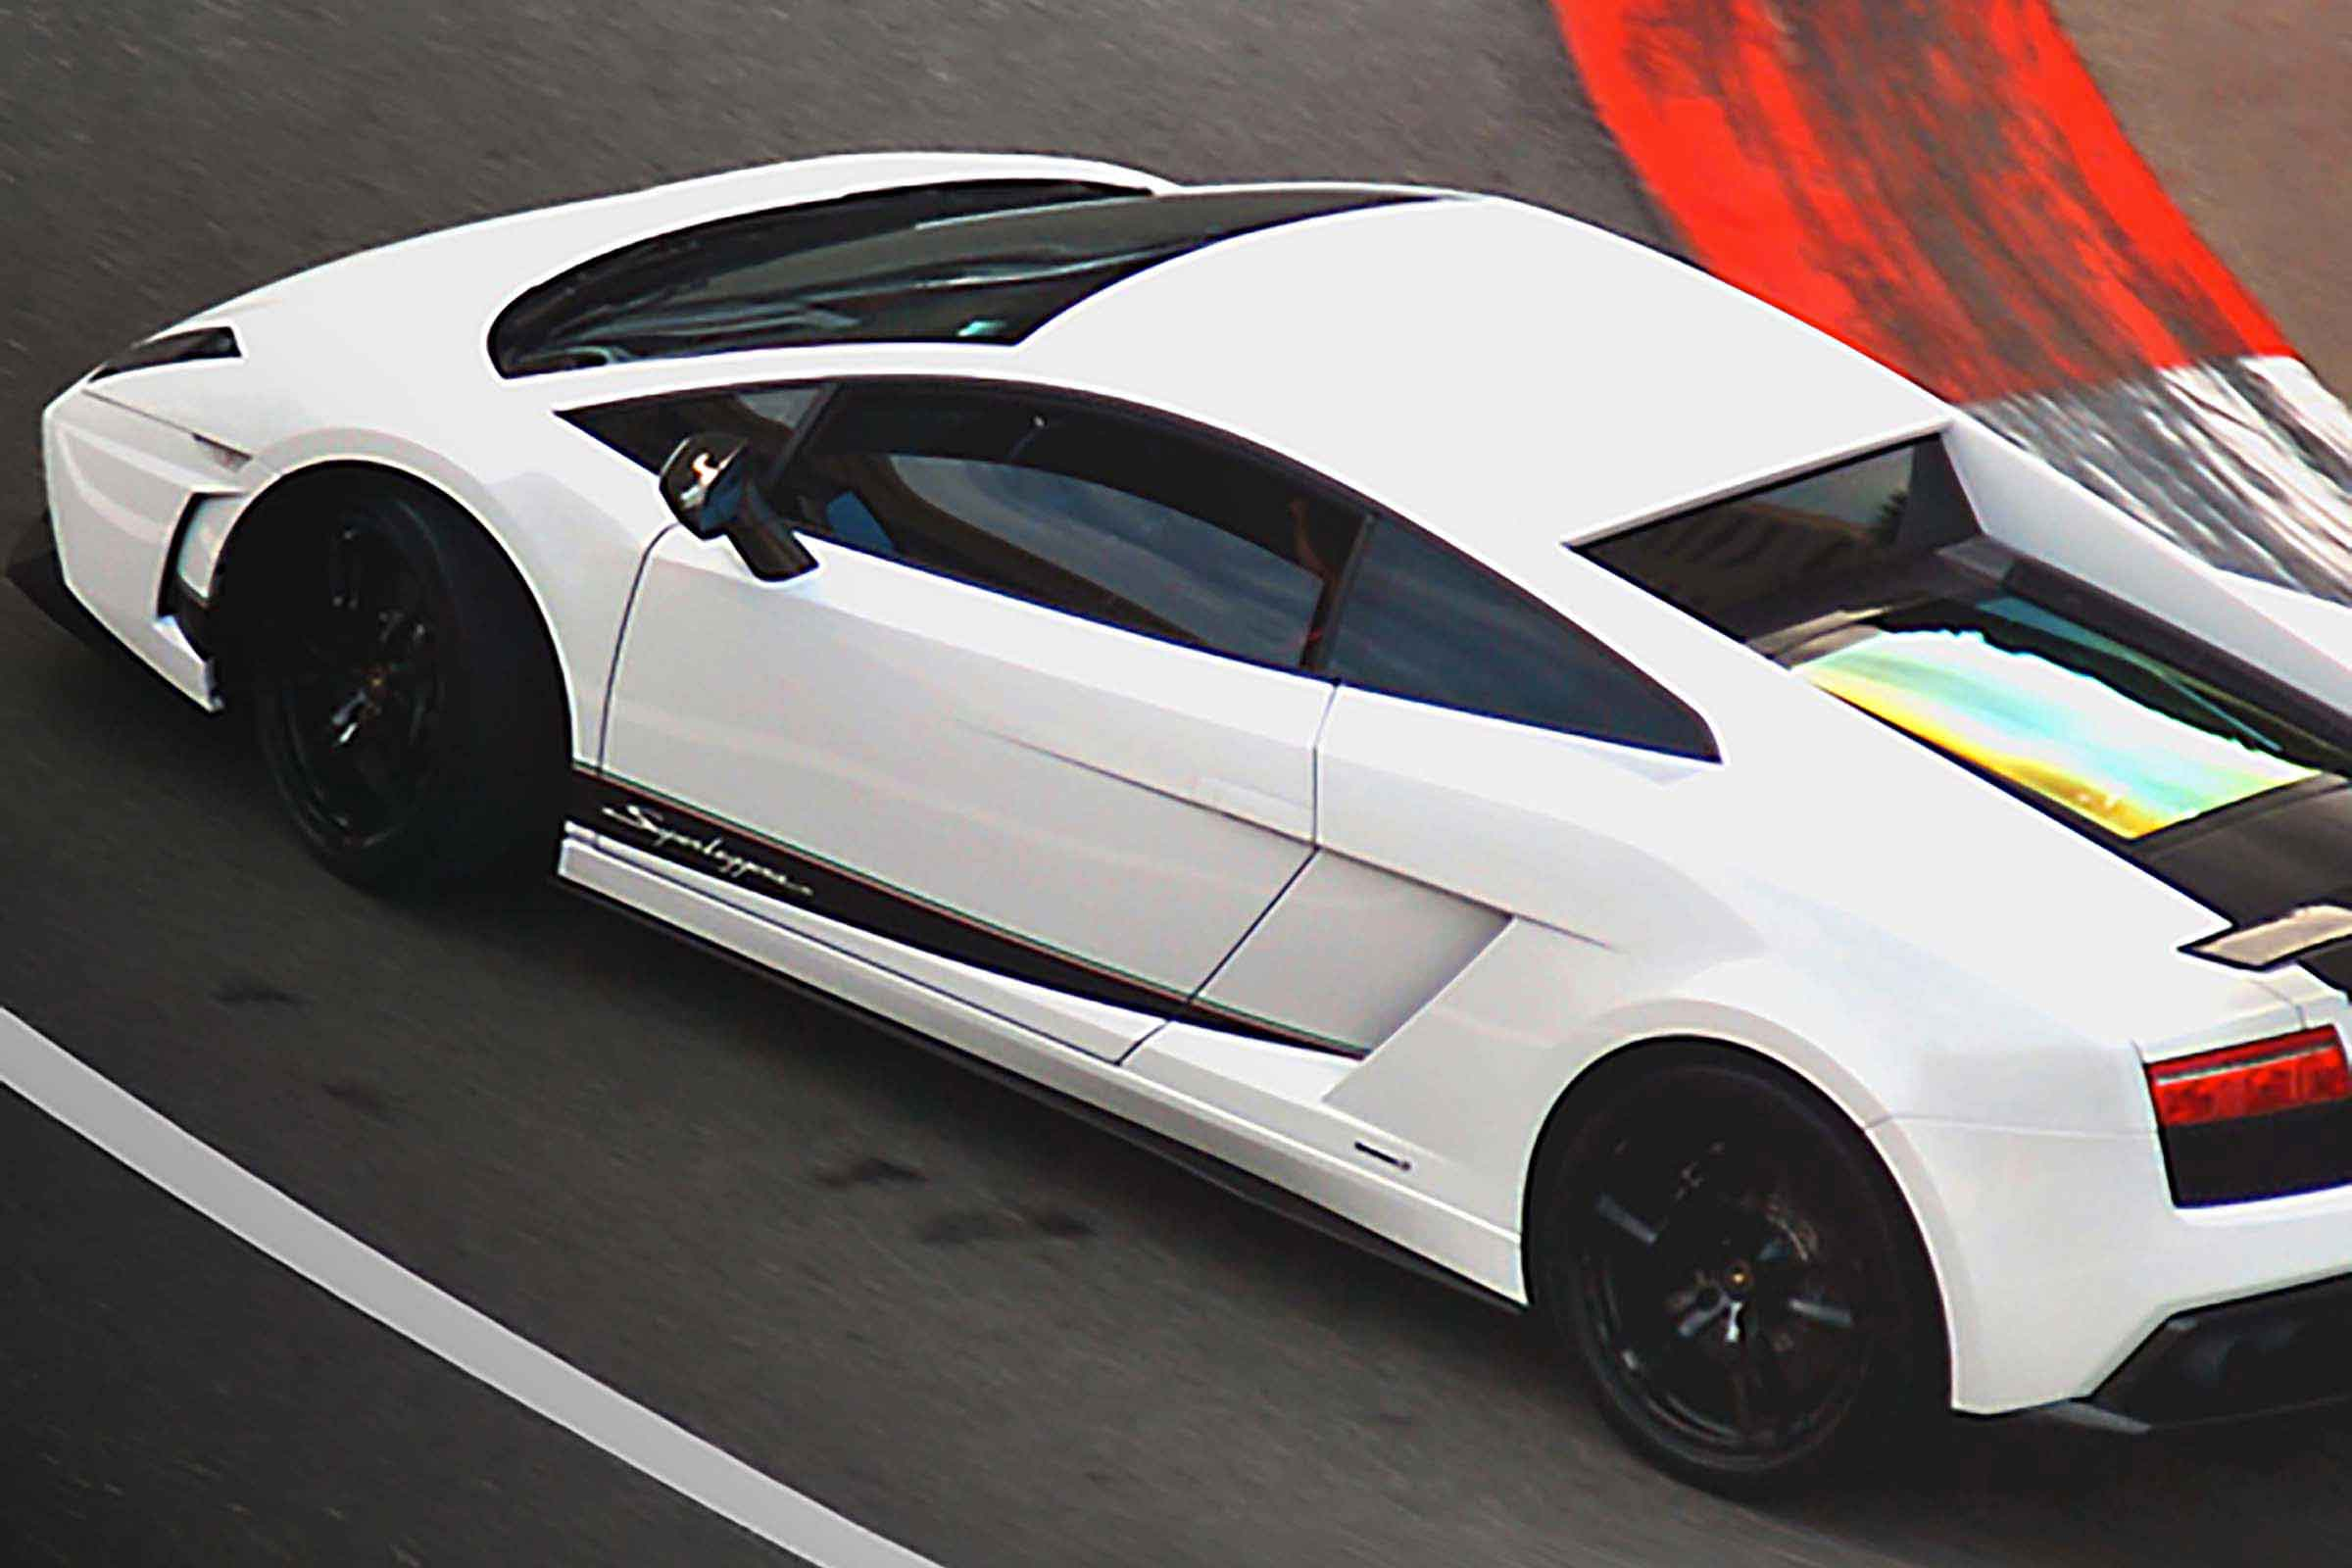 Kör Lamborghini på Racingbana